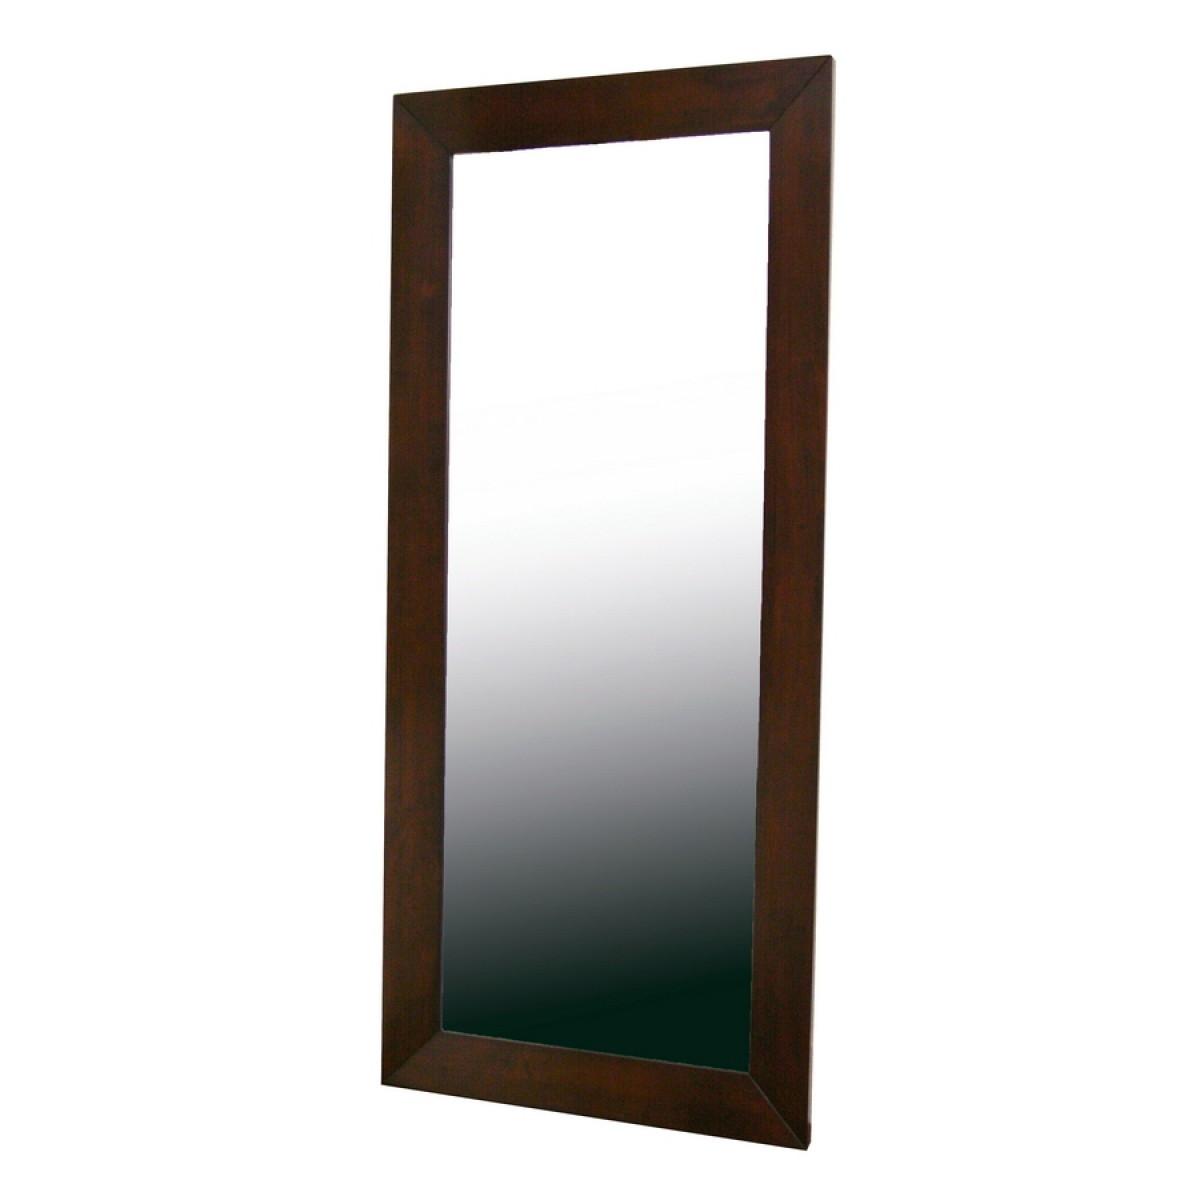 15 ideas of long brown mirror mirror ideas for Modern long mirror